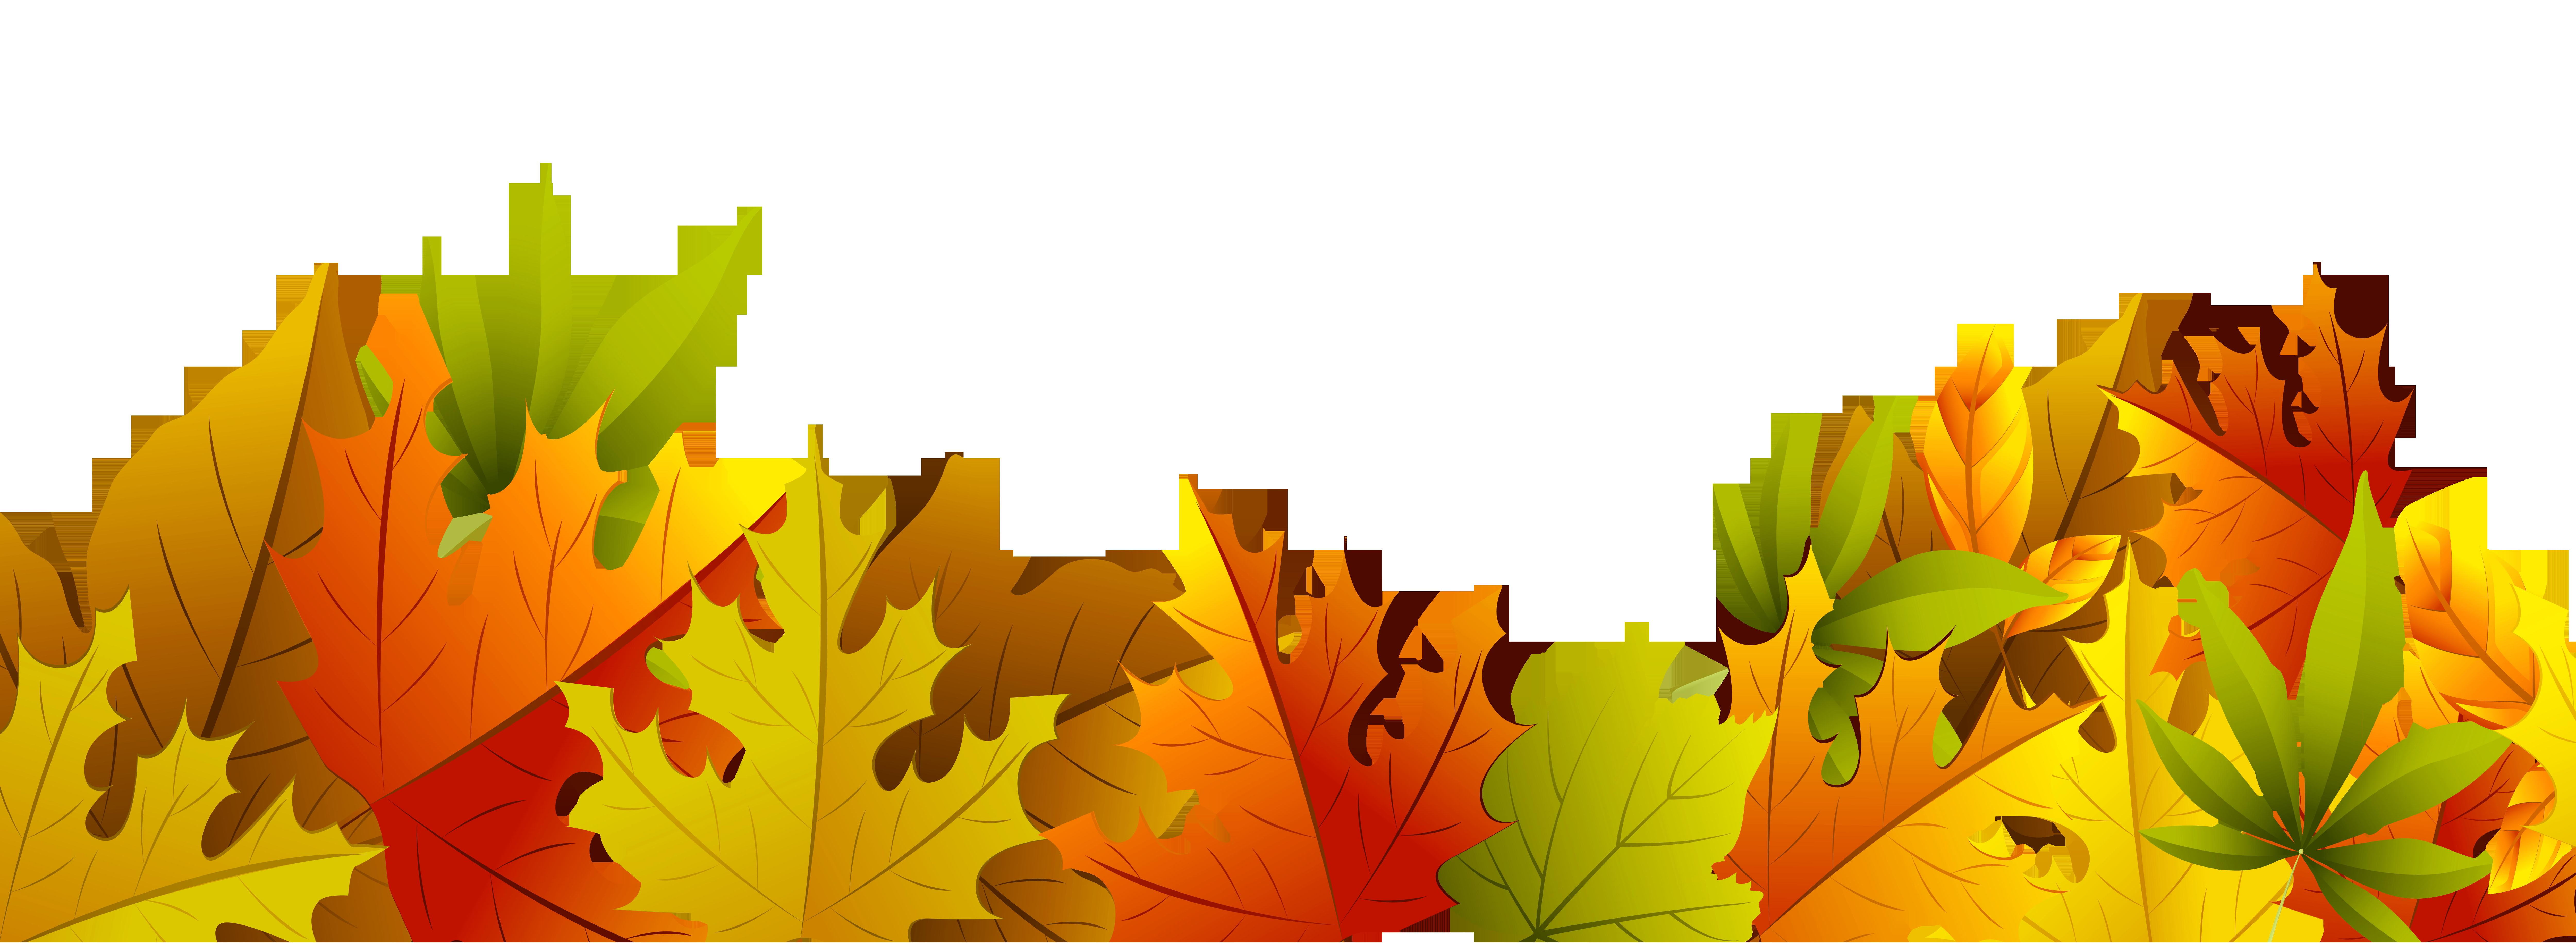 Festival clipart autumn leaf Art fall leaves Fall Clipartner